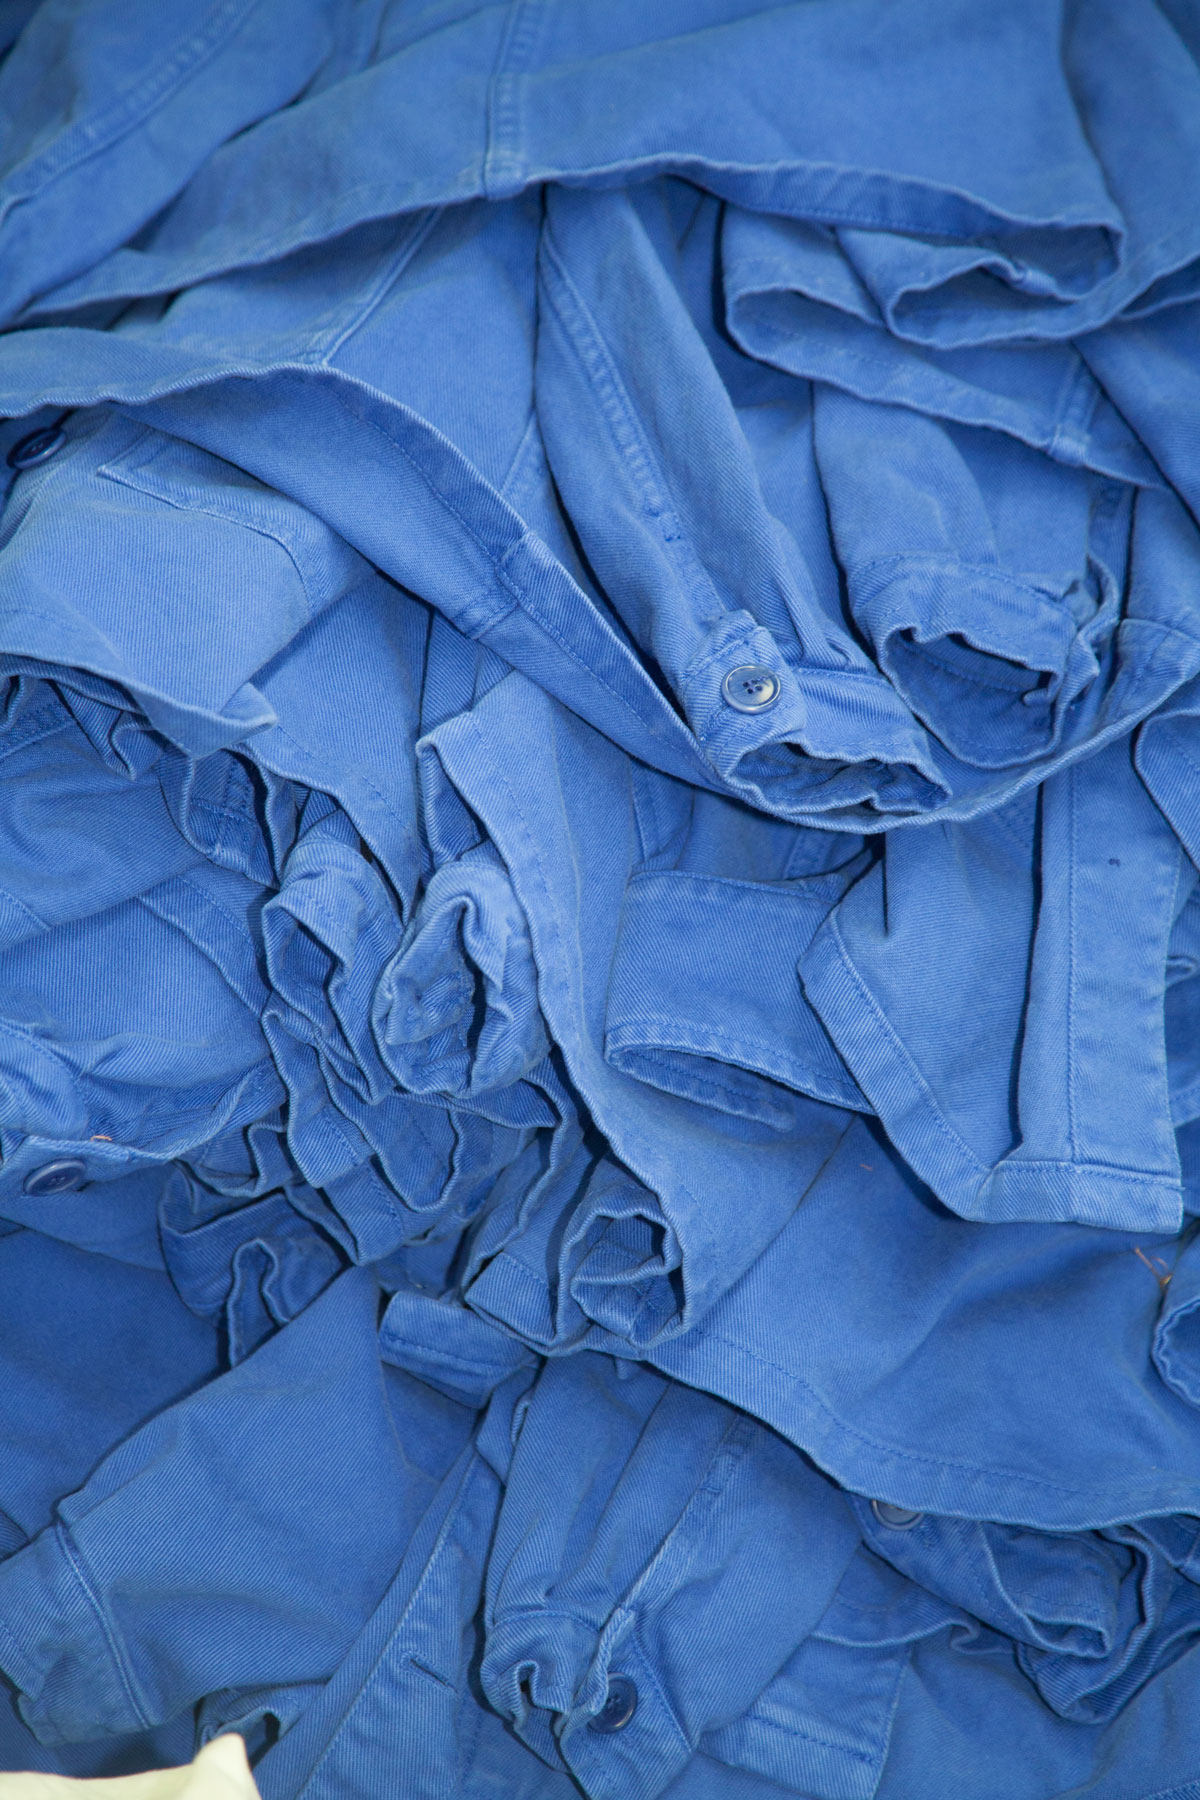 Graine Atelier Portugal Tissus Vestes Bleues